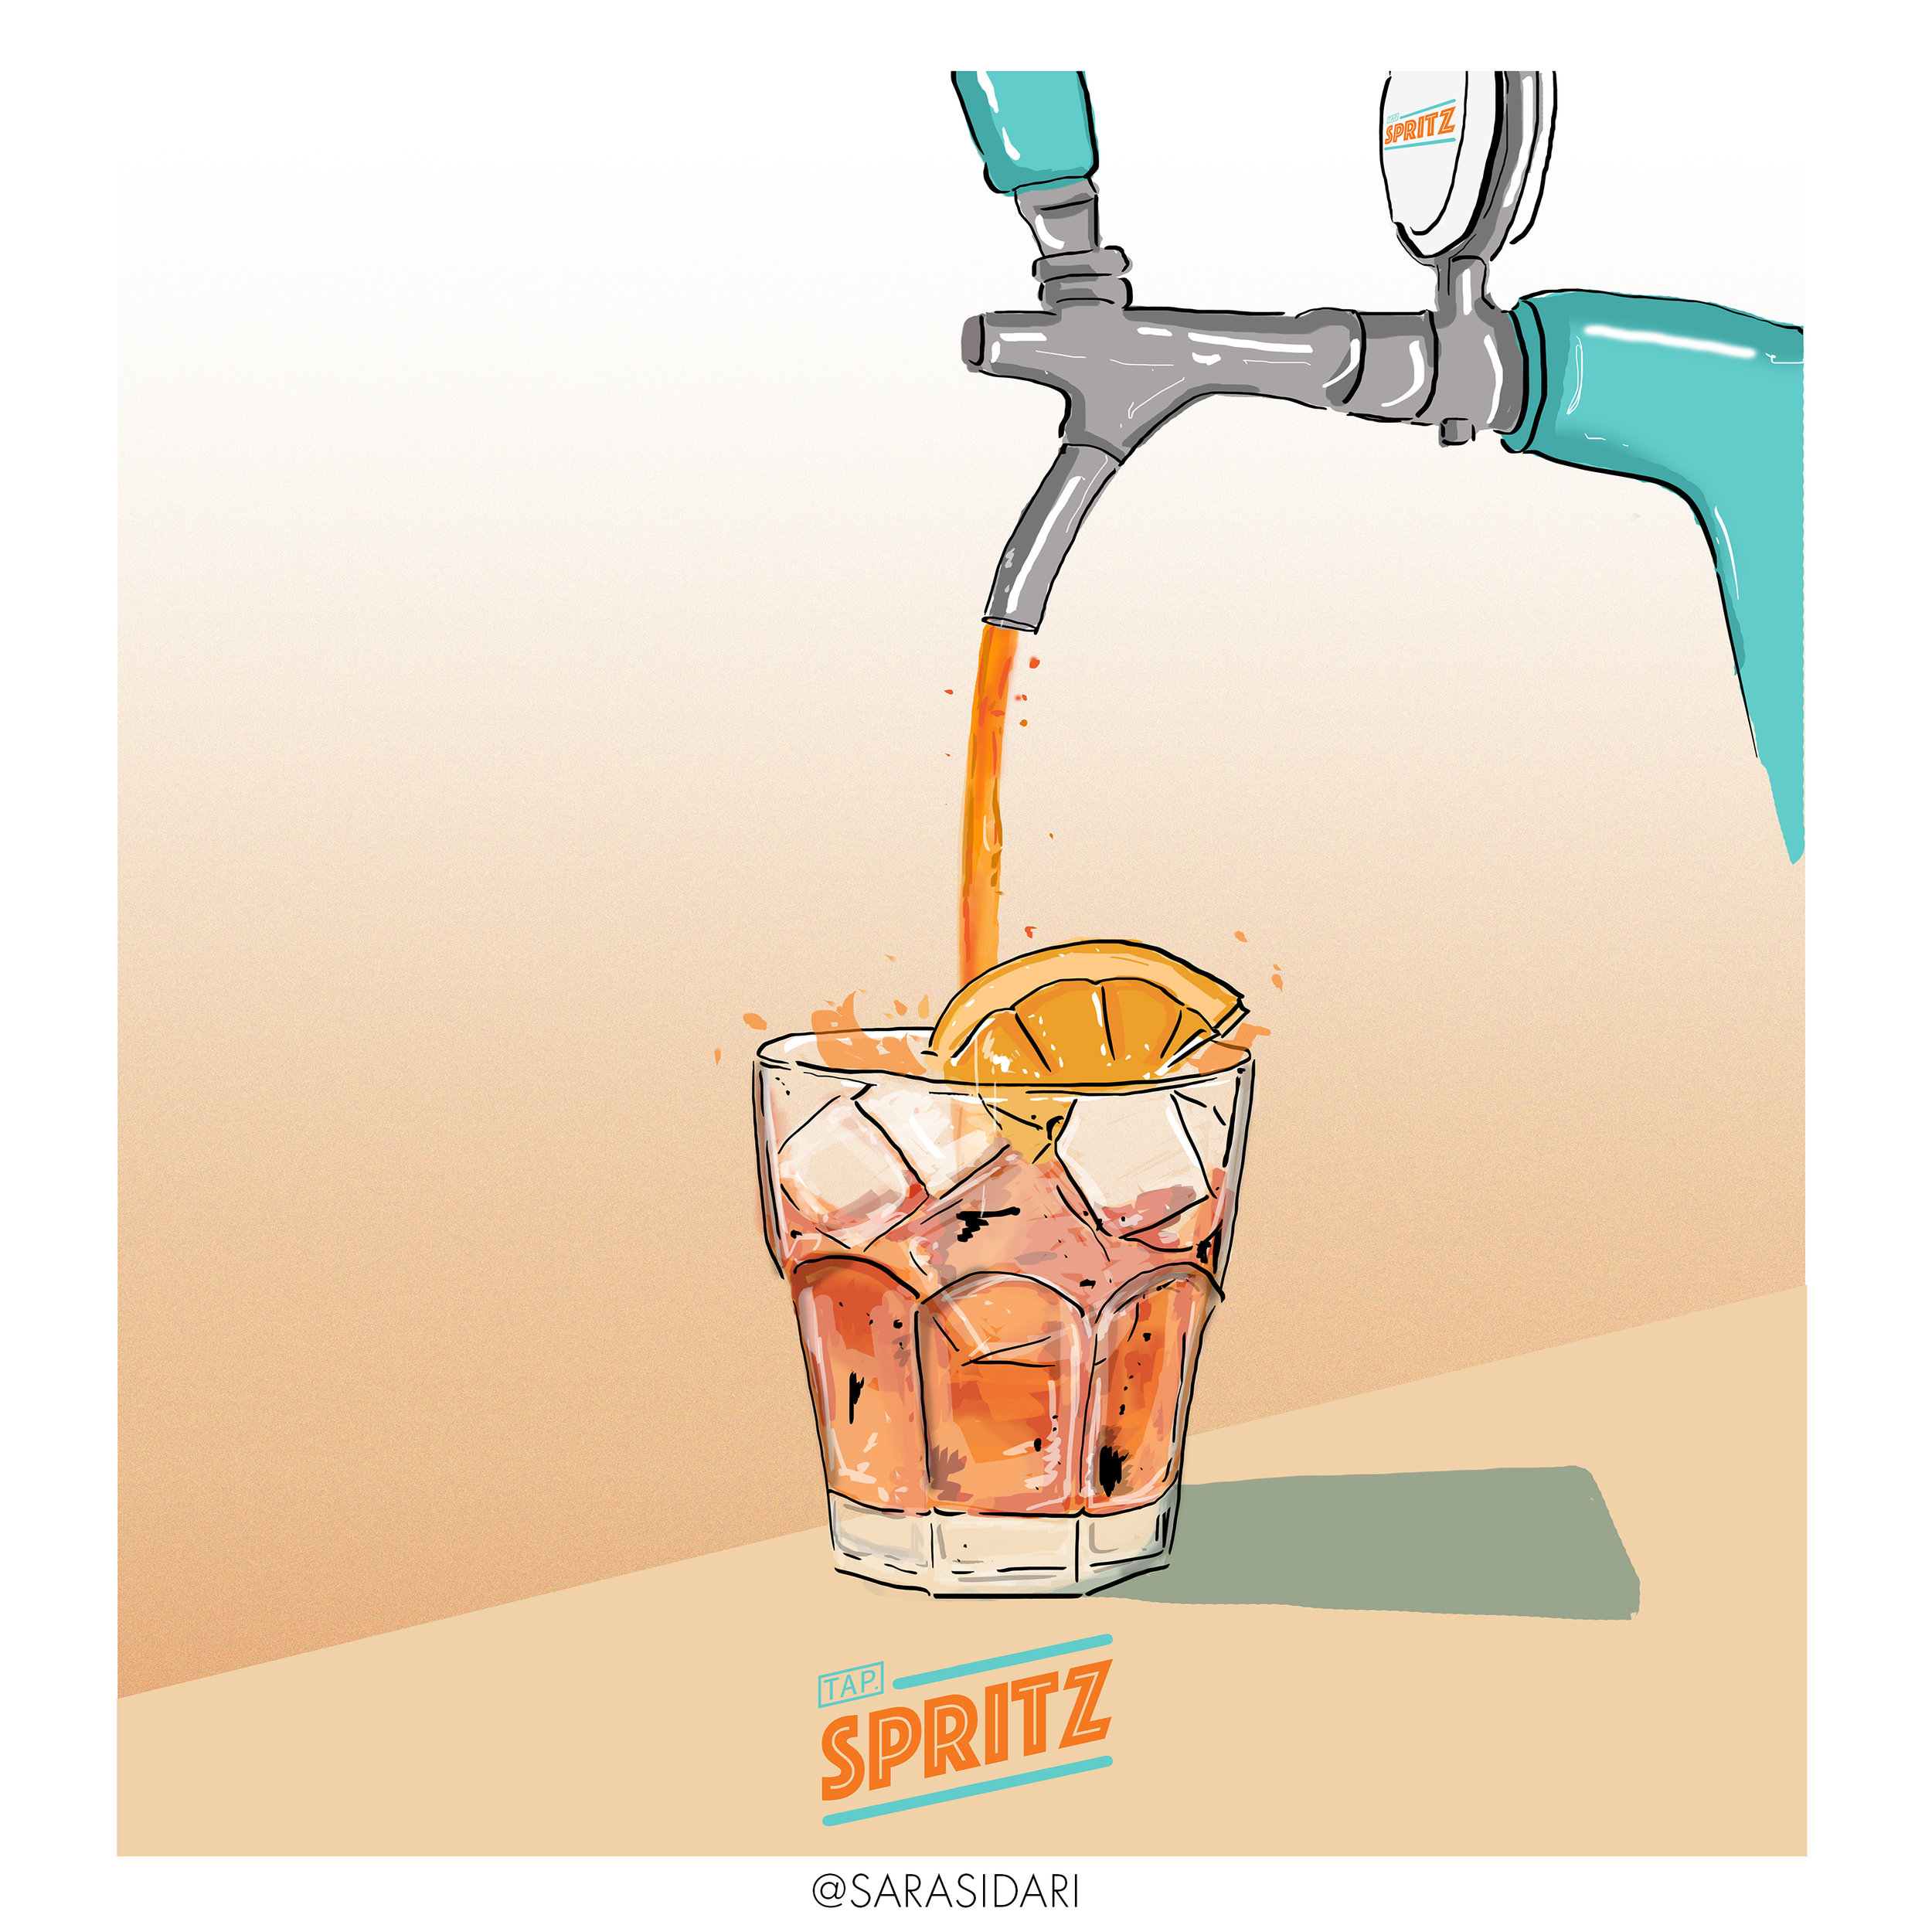 spritz tap branding illustrations04.jpg